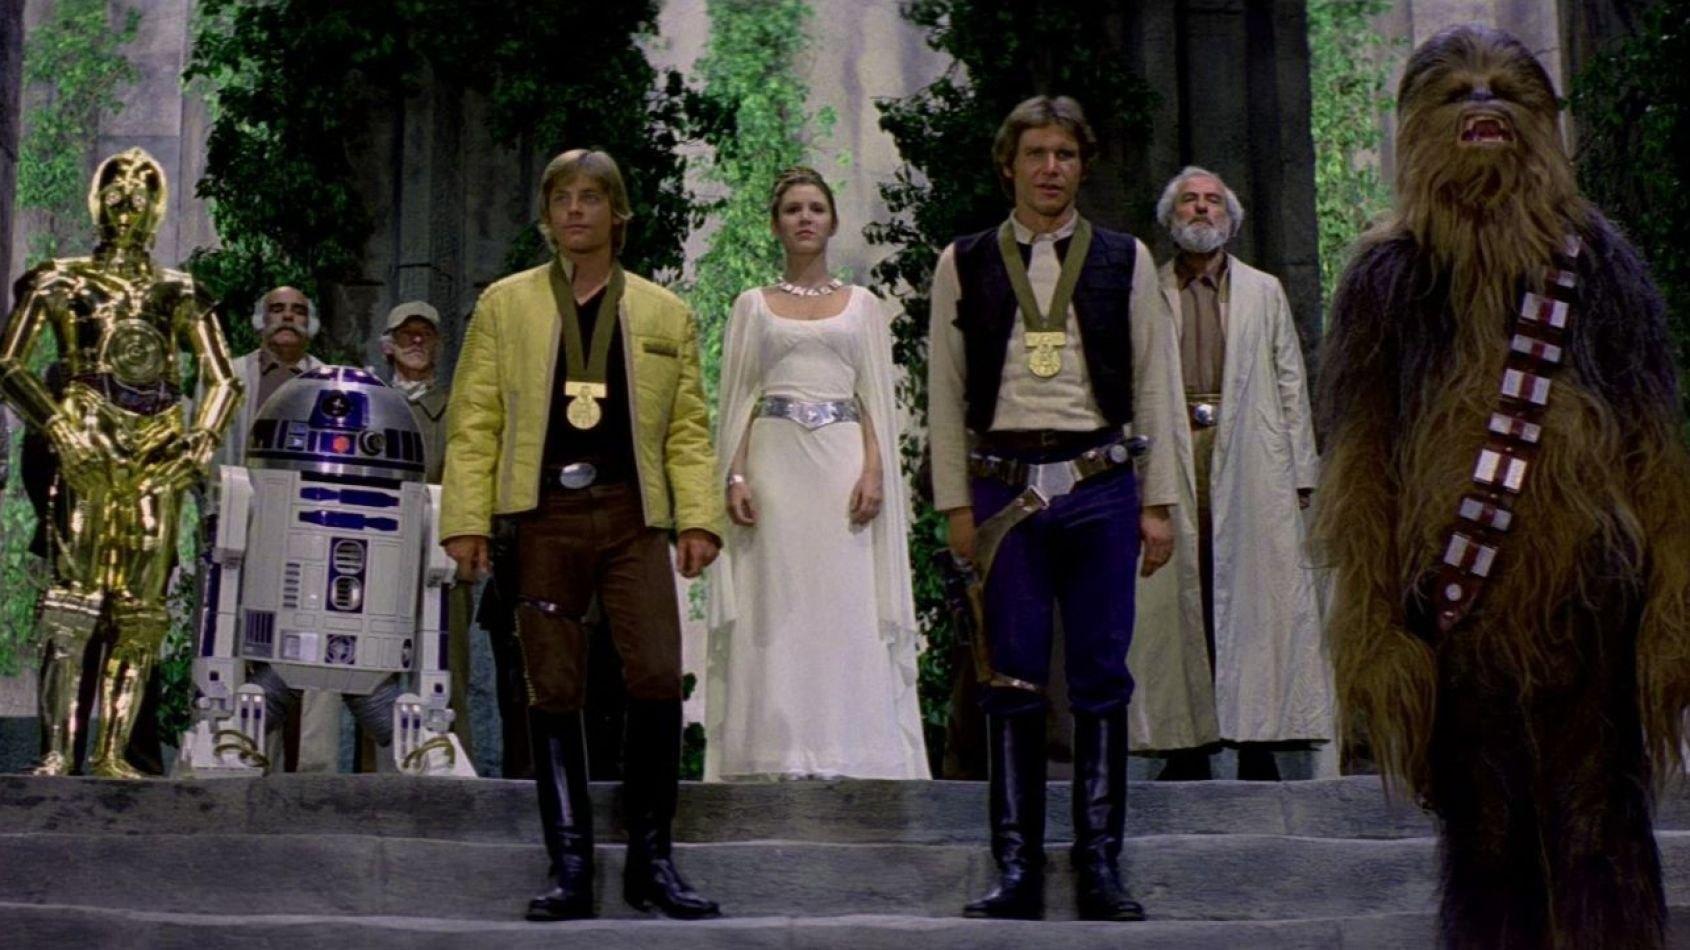 La Saga Star Wars diffusée en Mai sur TMC